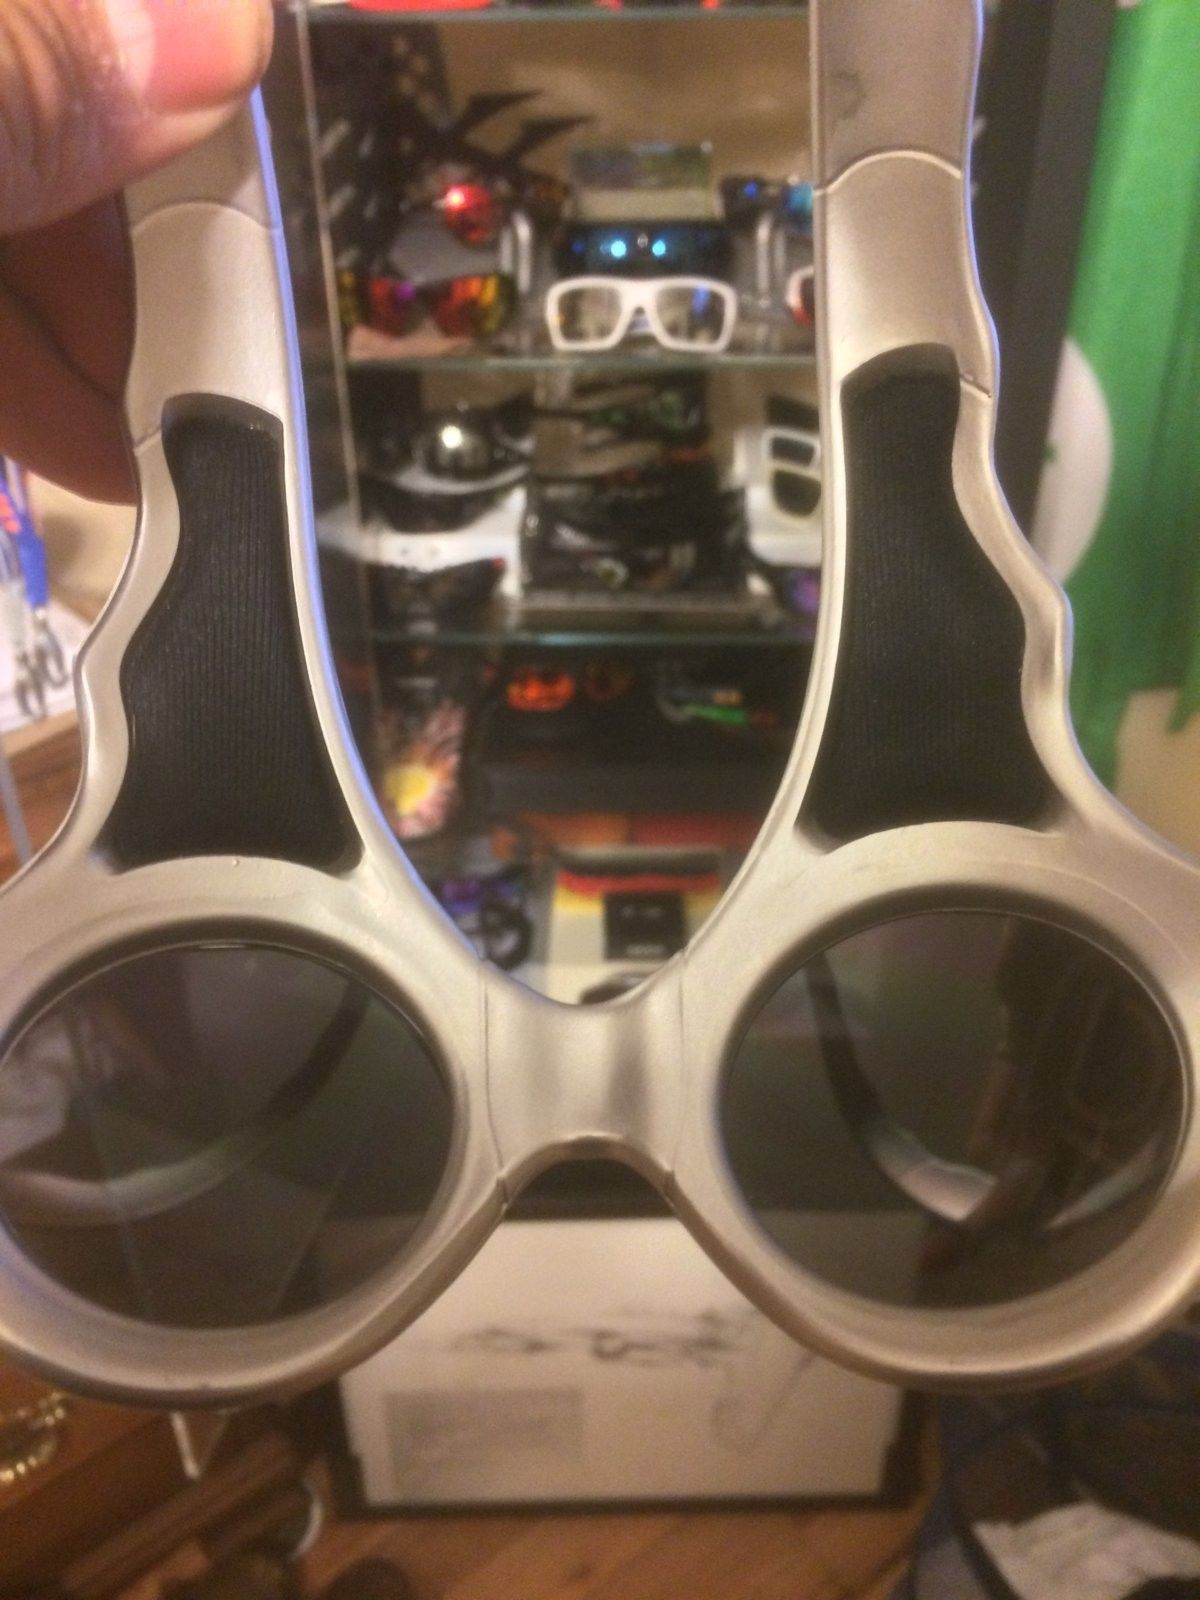 OTT+2 custom cut lenses (price drop) - image.jpeg